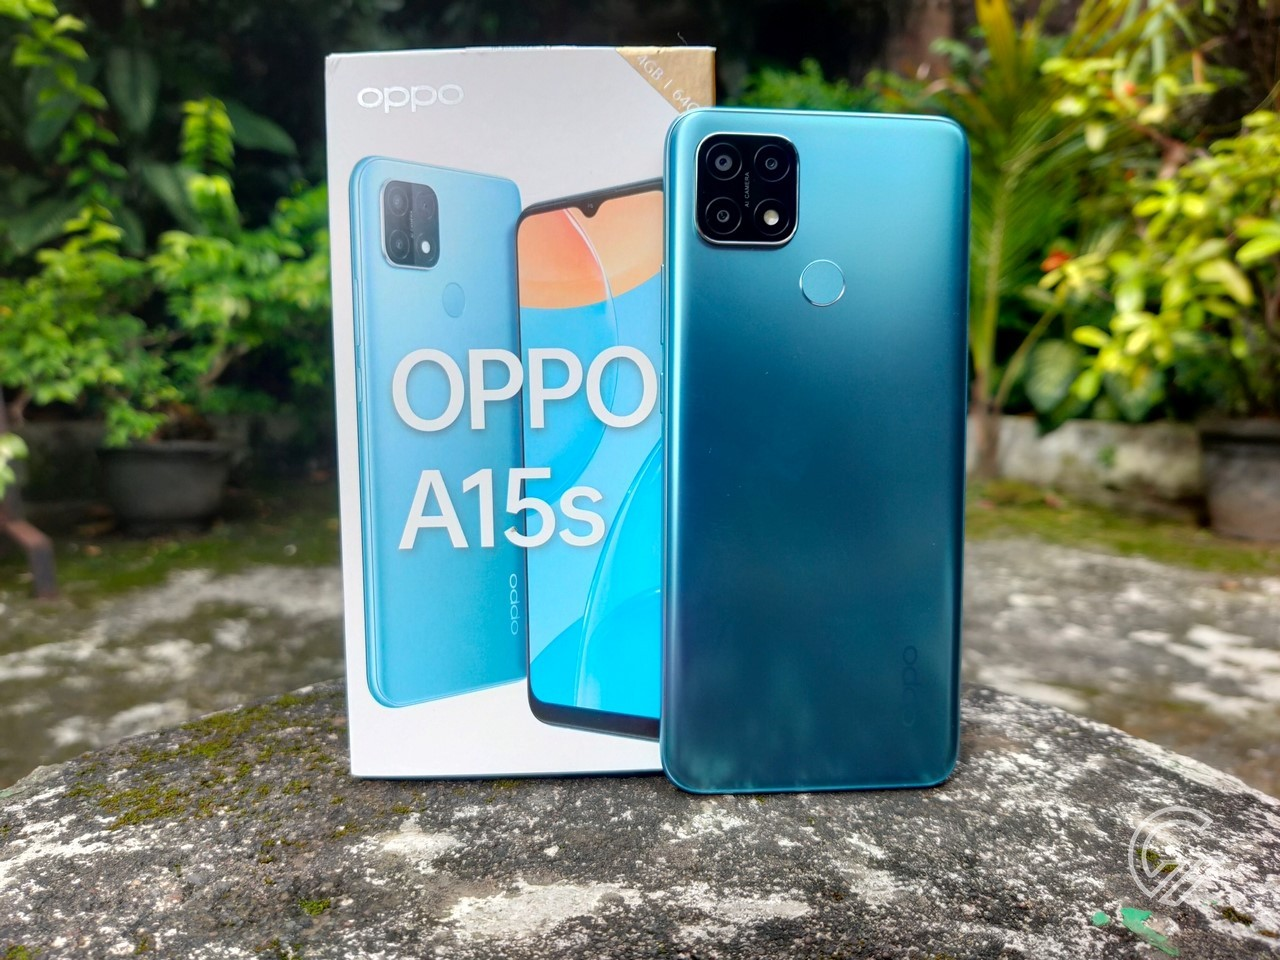 OPPO-A15s-Box